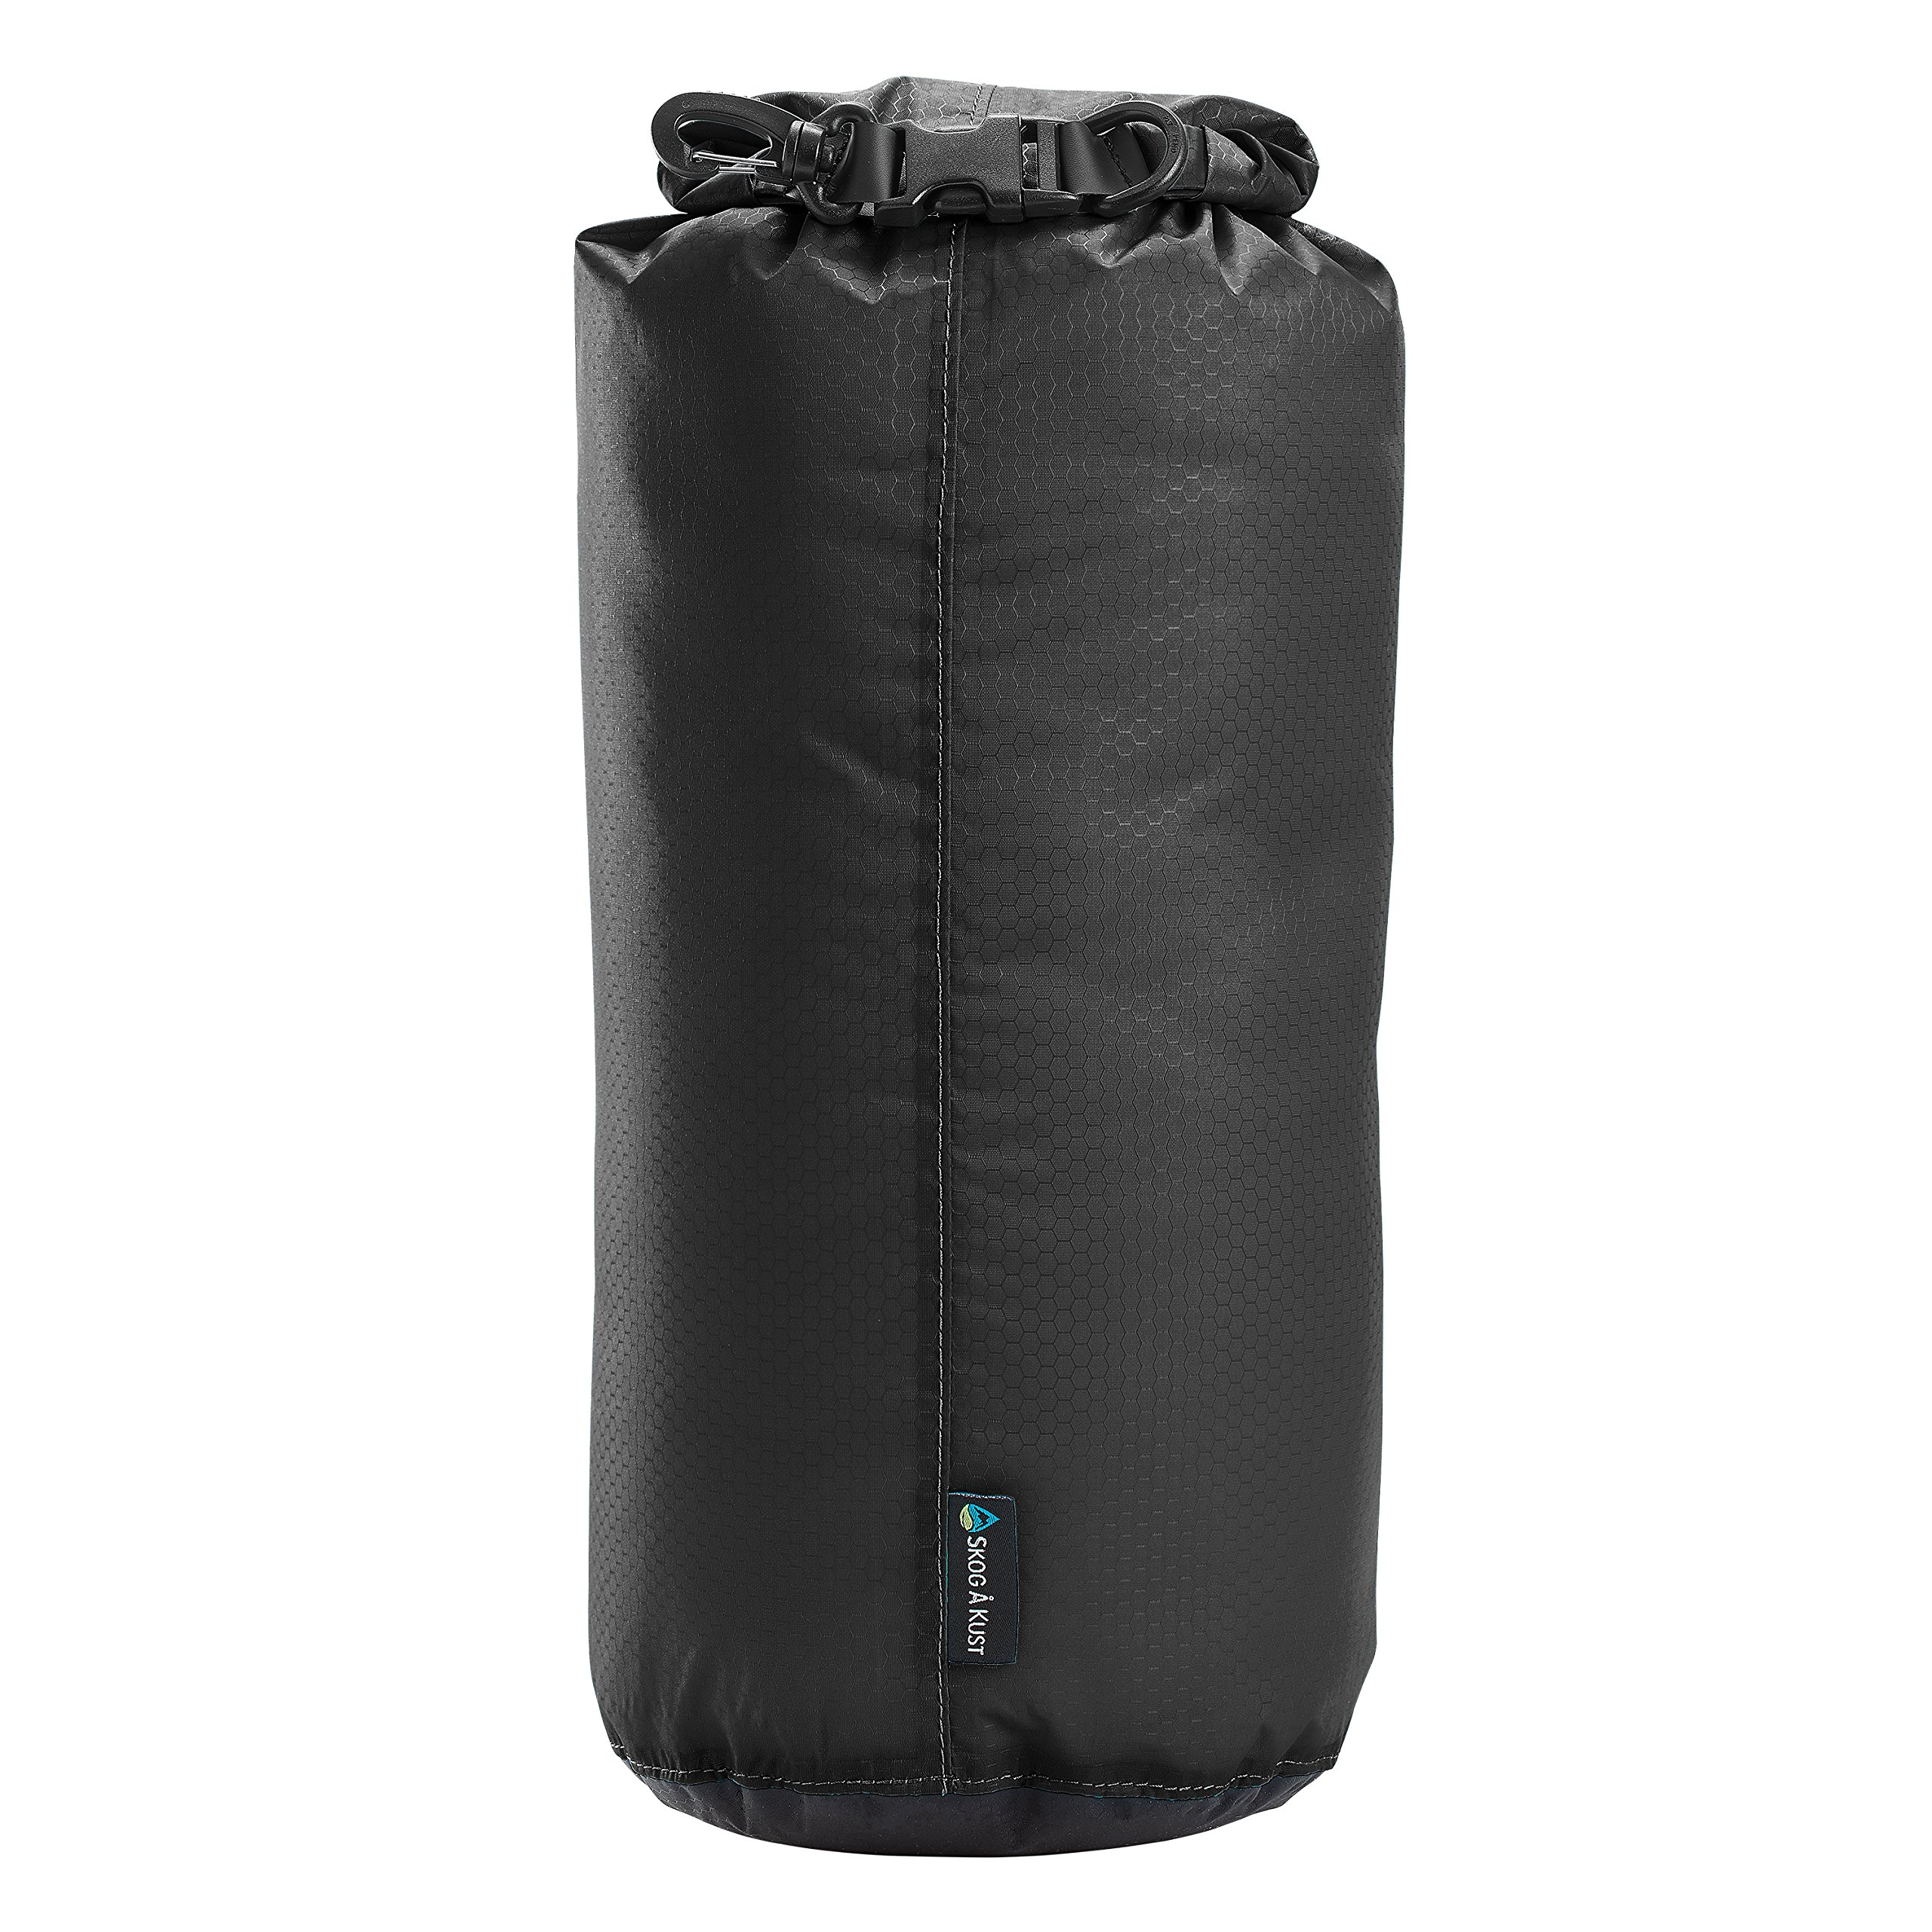 Såk Gear LiteSåk 2.0 Waterproof Ultralight Dry Bag | Black 2.0, 1.5 Liter